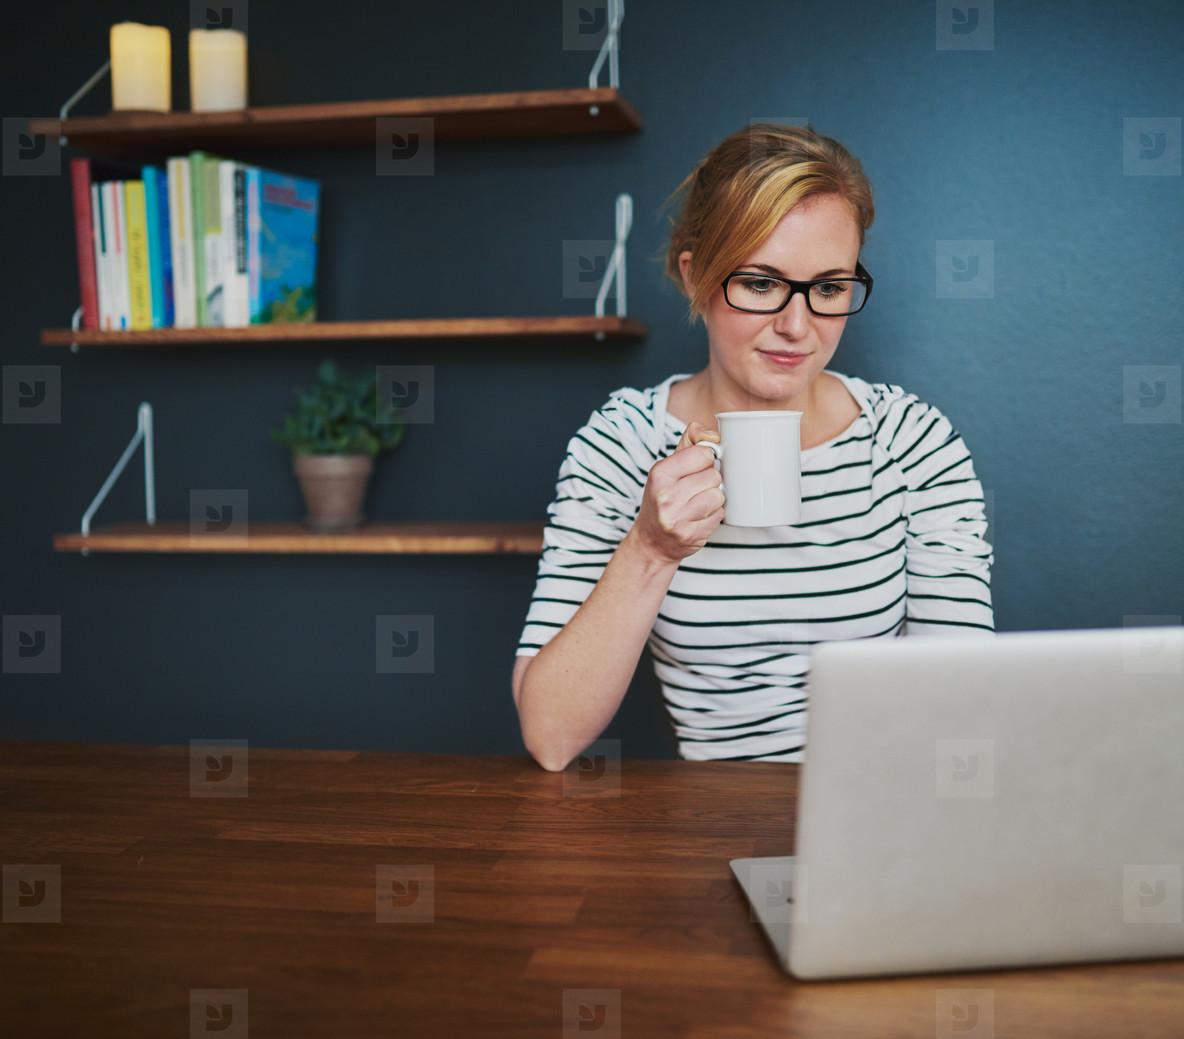 Female entrepreneur working at desk